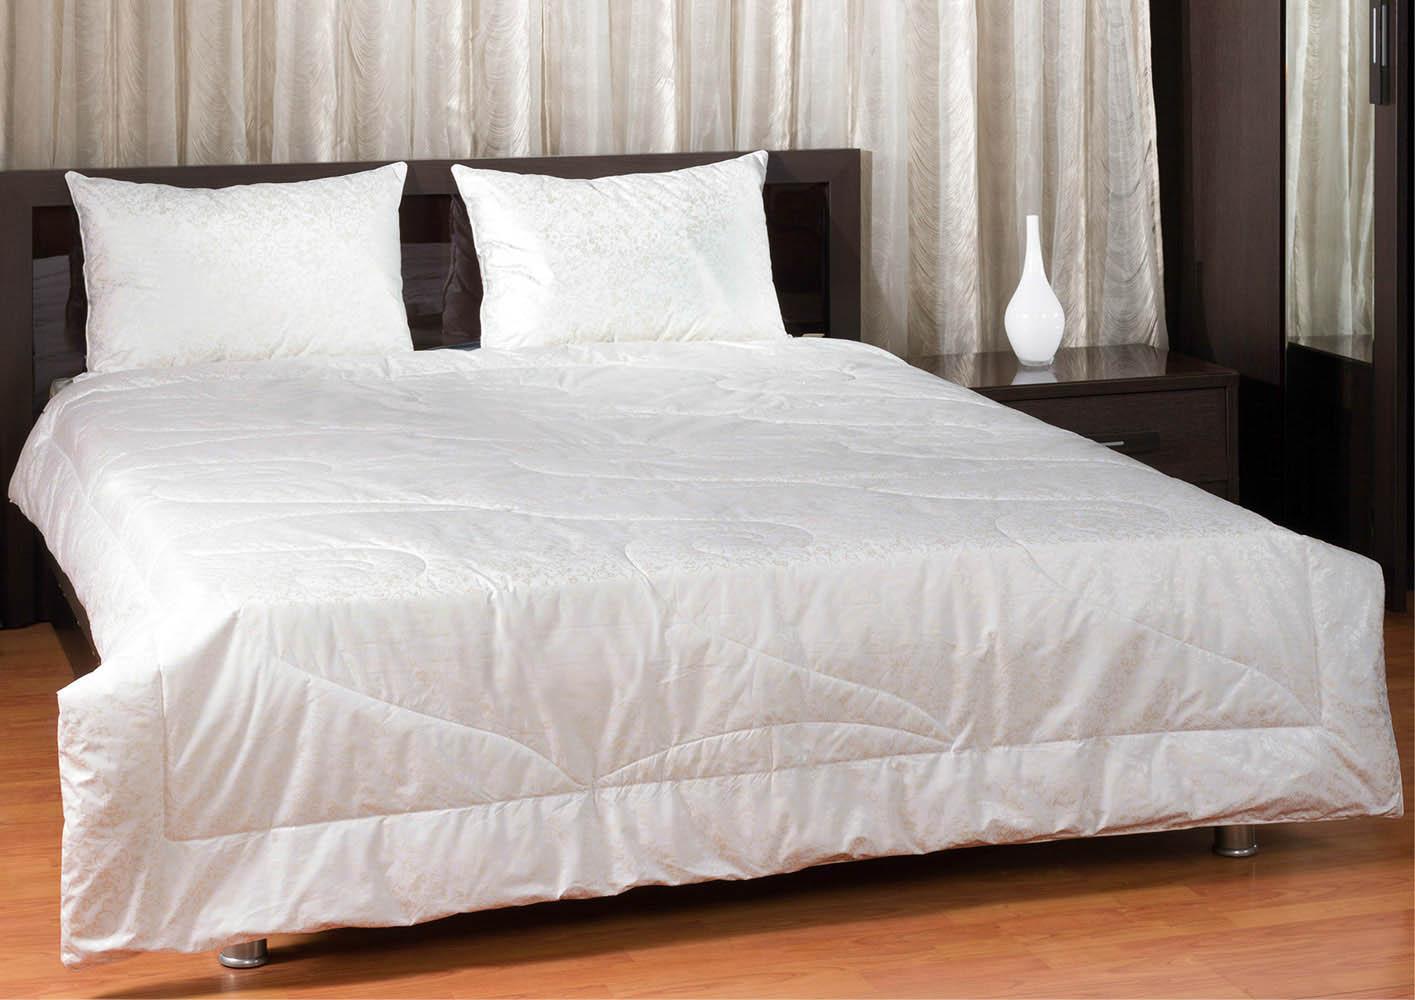 Одеяла Primavelle Одеяло Лебяжий Пух Цвет: Белый (172х205 см)